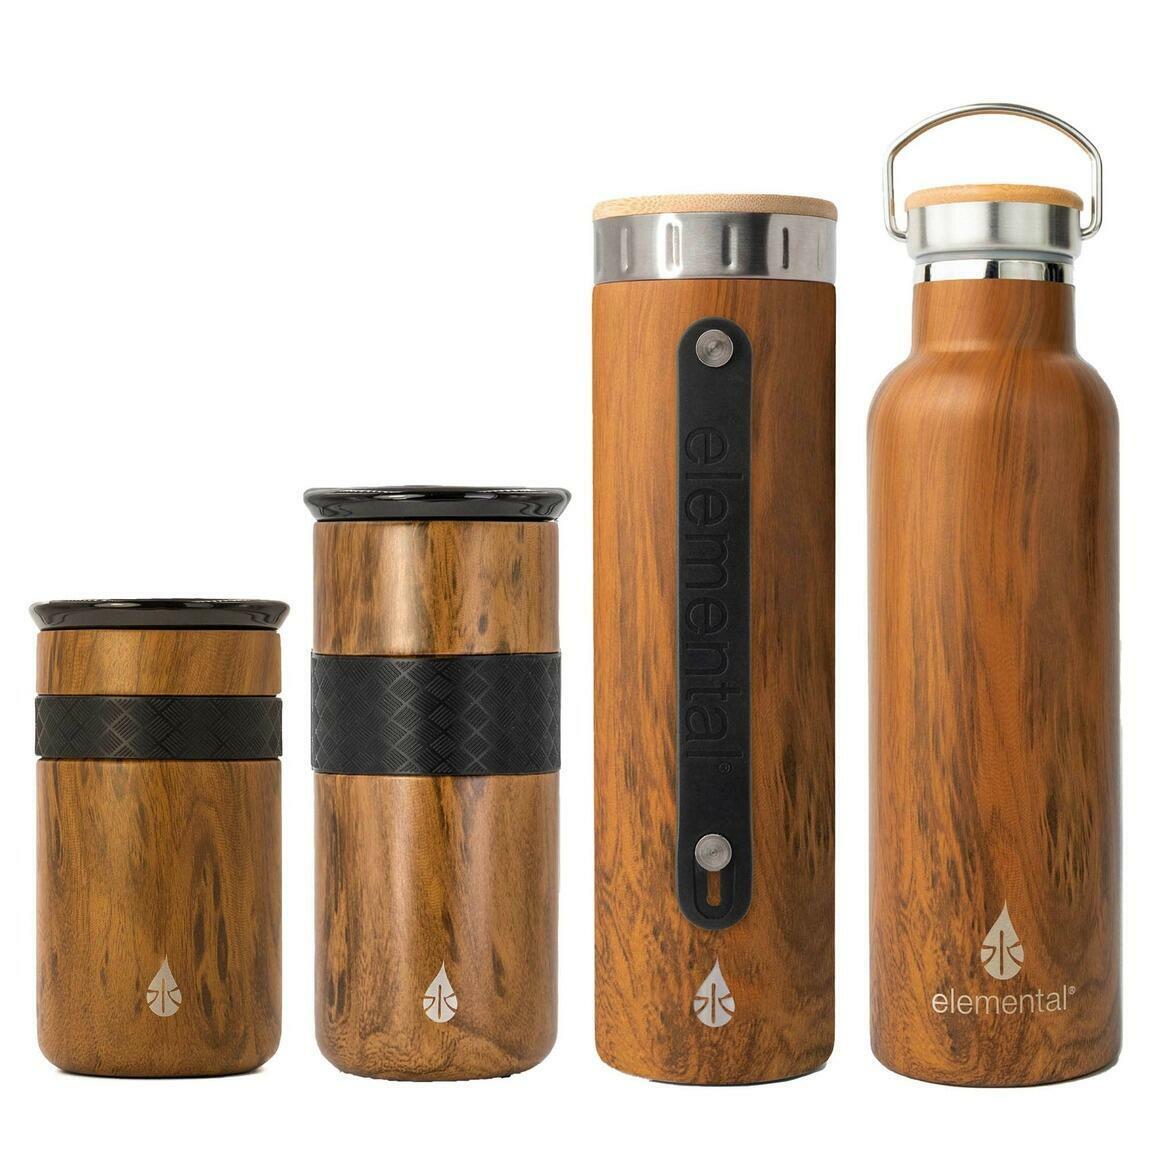 Sample Pack of Elemental Drinkware Products - Teak Wood   Trada Marketplace